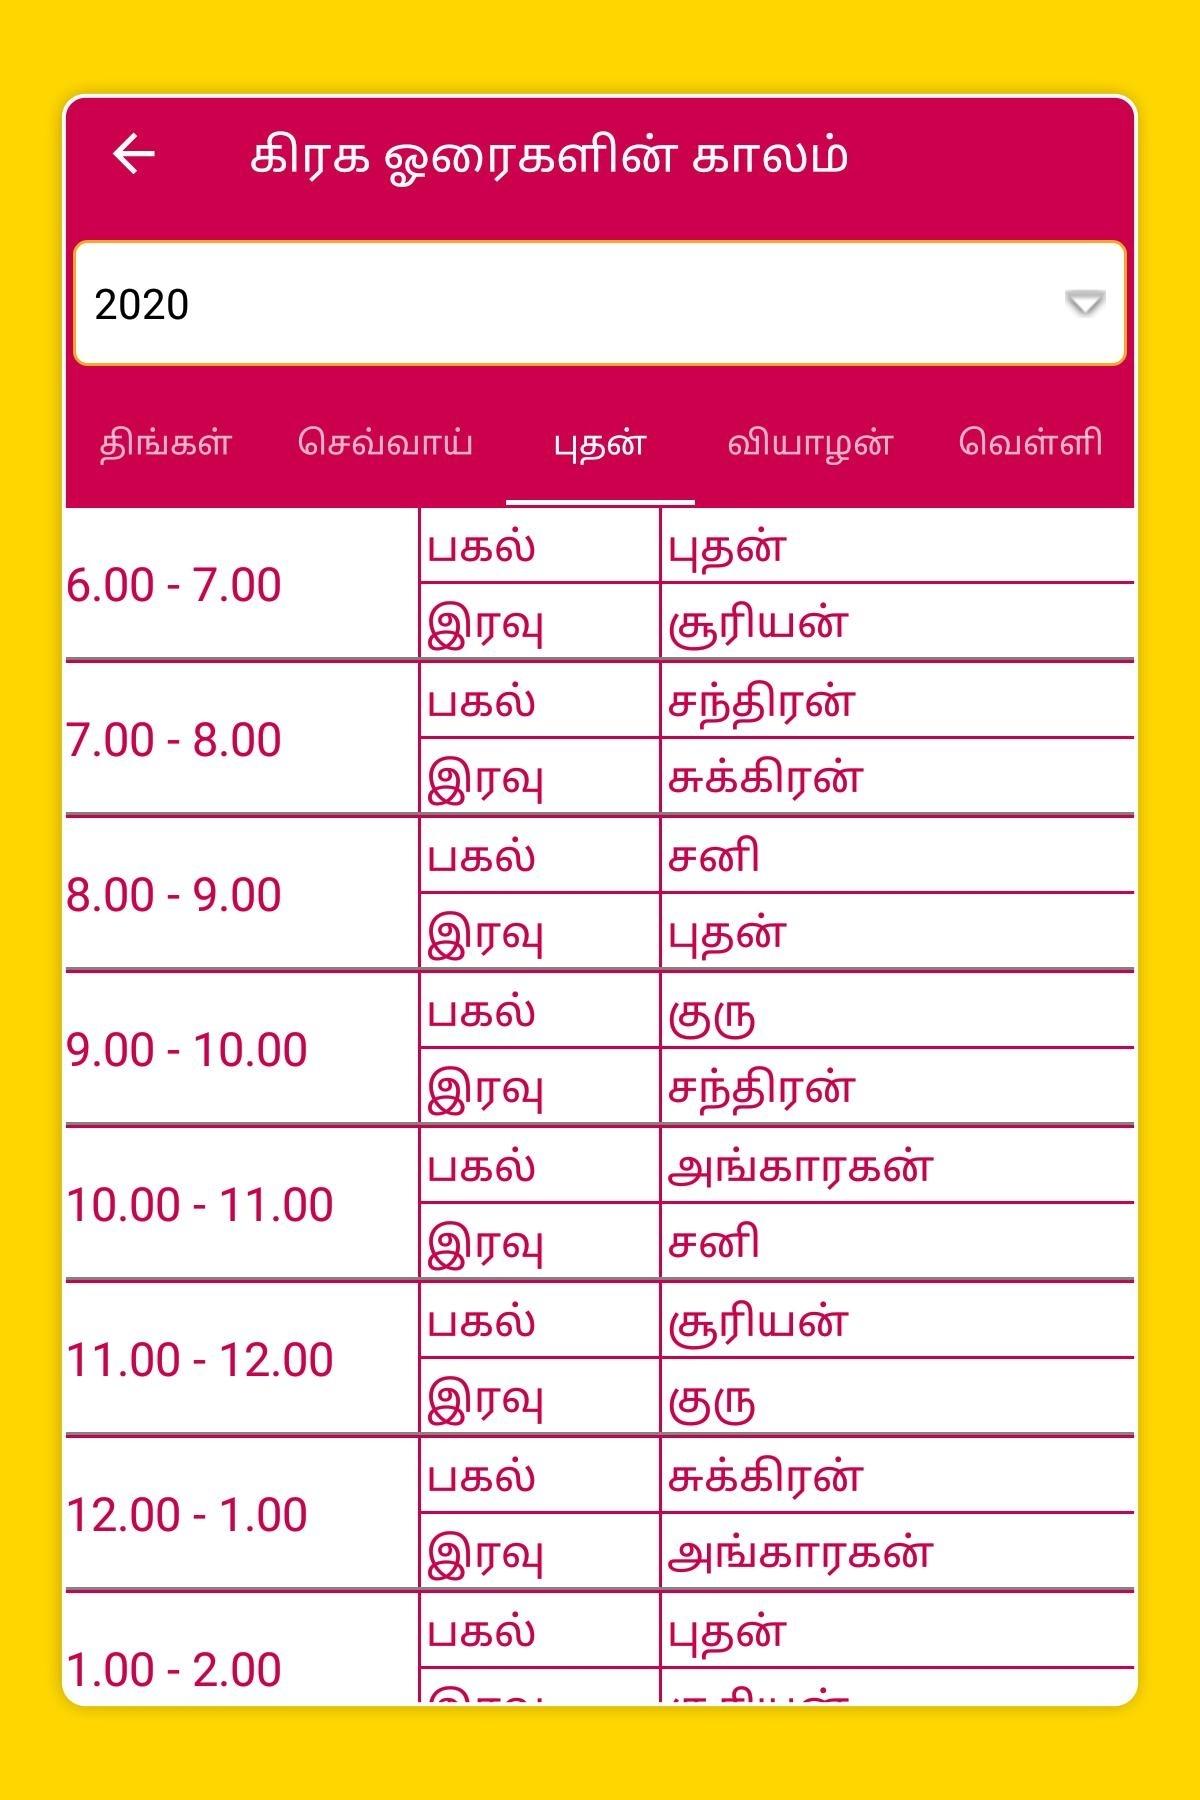 Tamil Calendar 2020 Tamil Calendar Panchangam 2020 For Android - Apk Download November 14 2021 Tamil Calendar